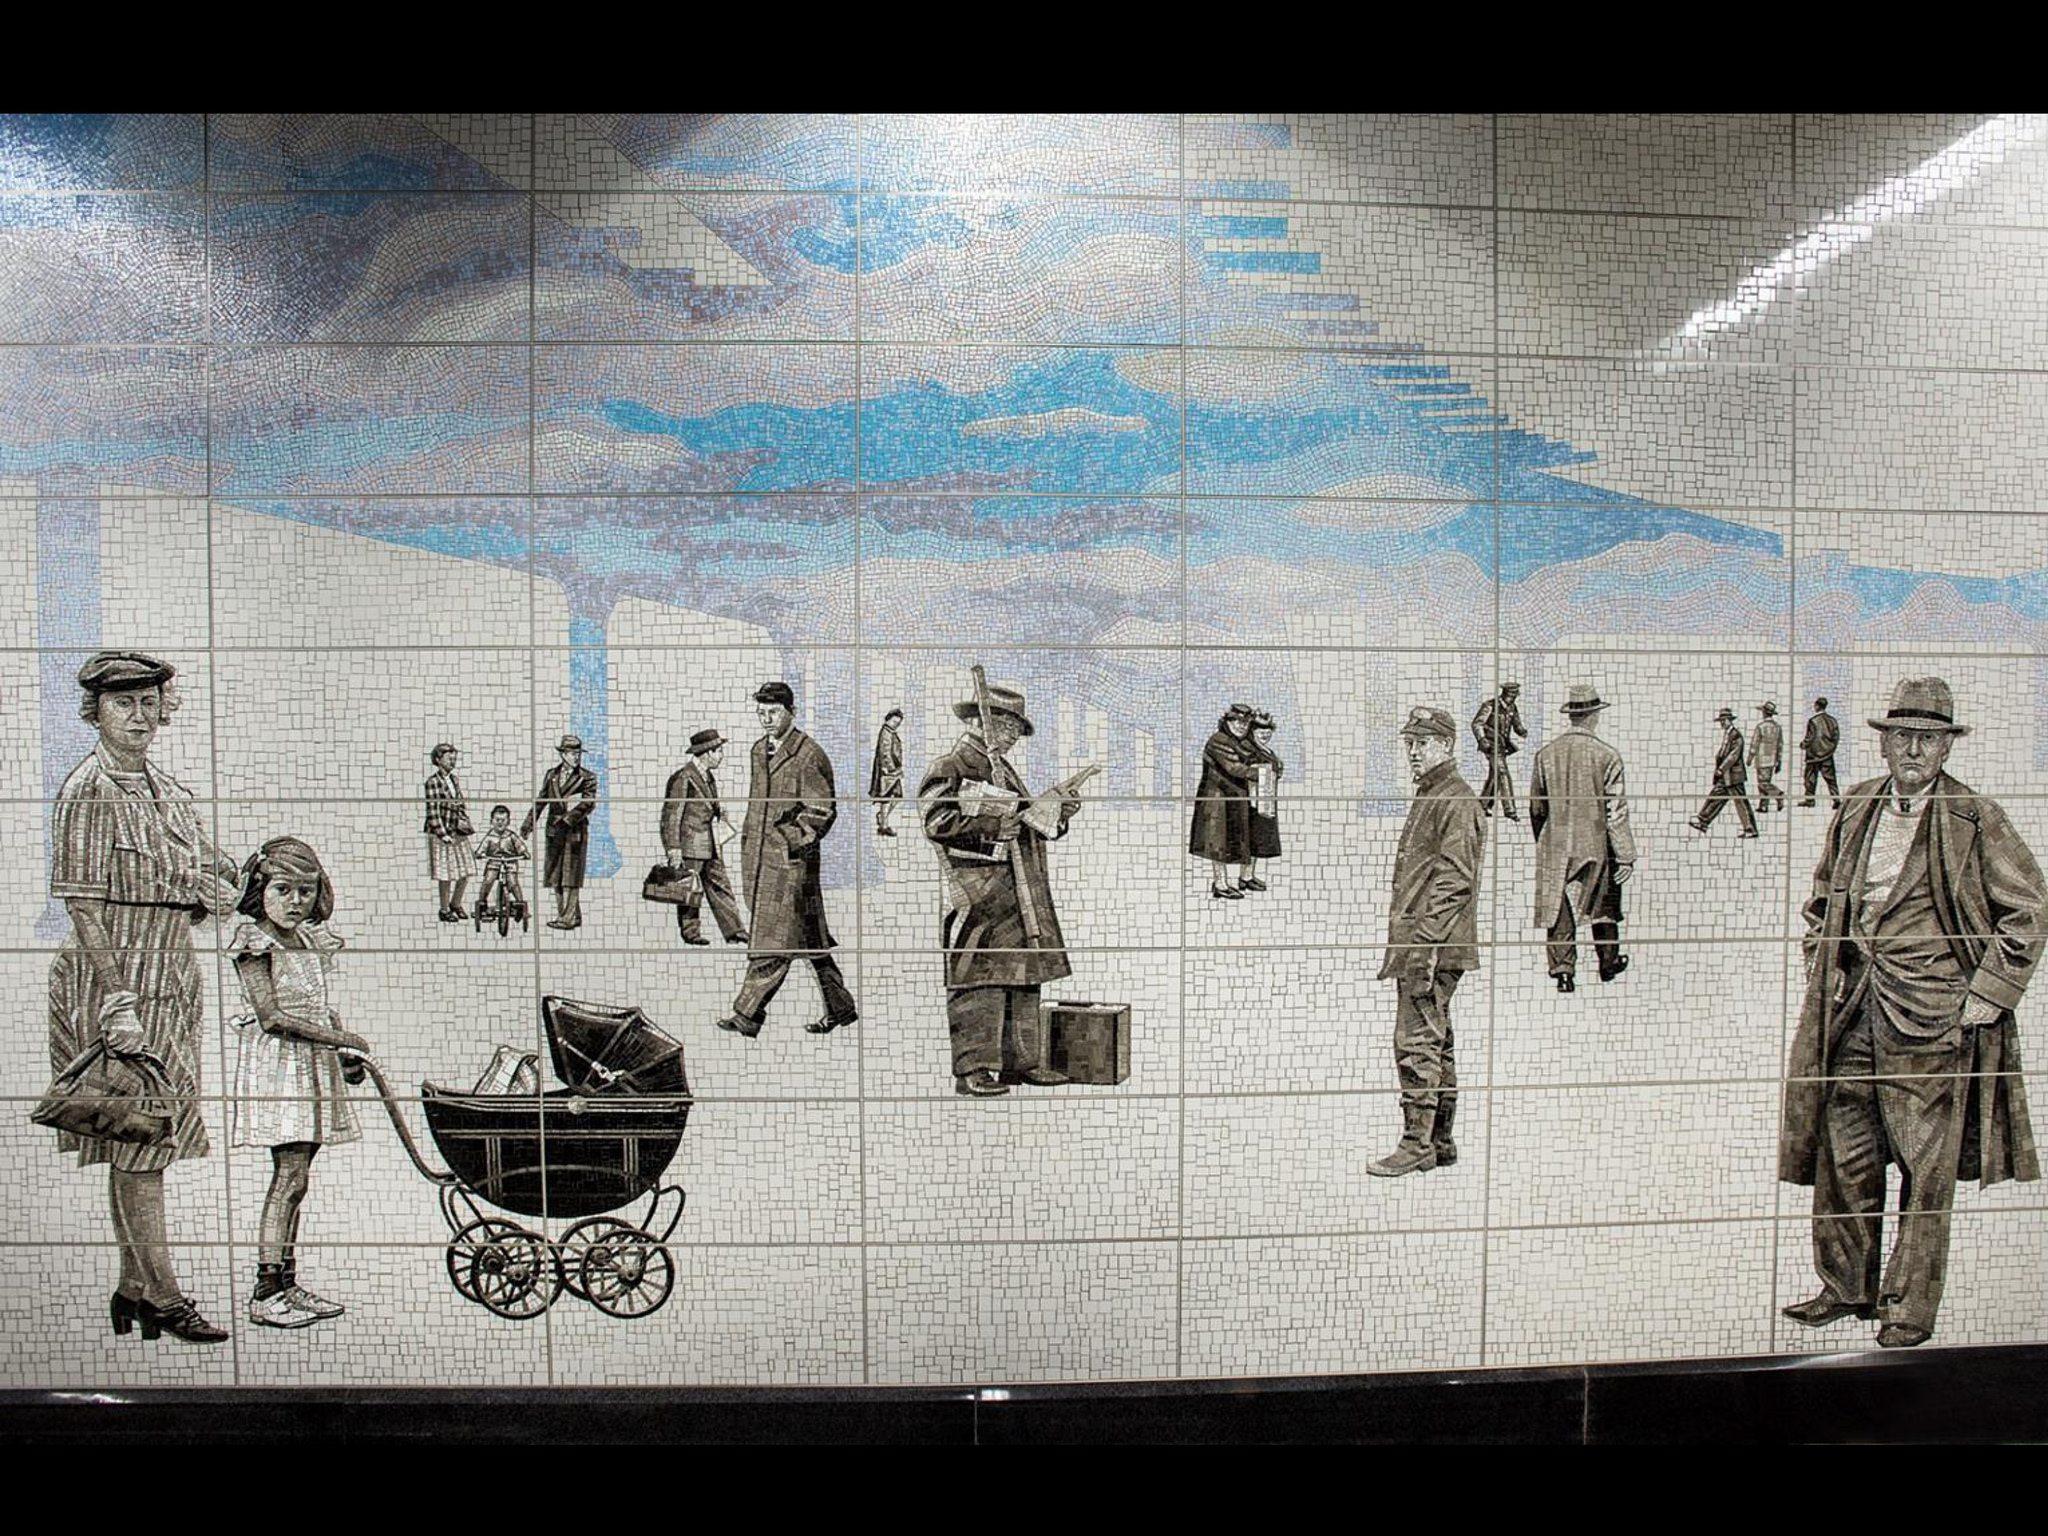 second-avenue-subway-art-12.jpg